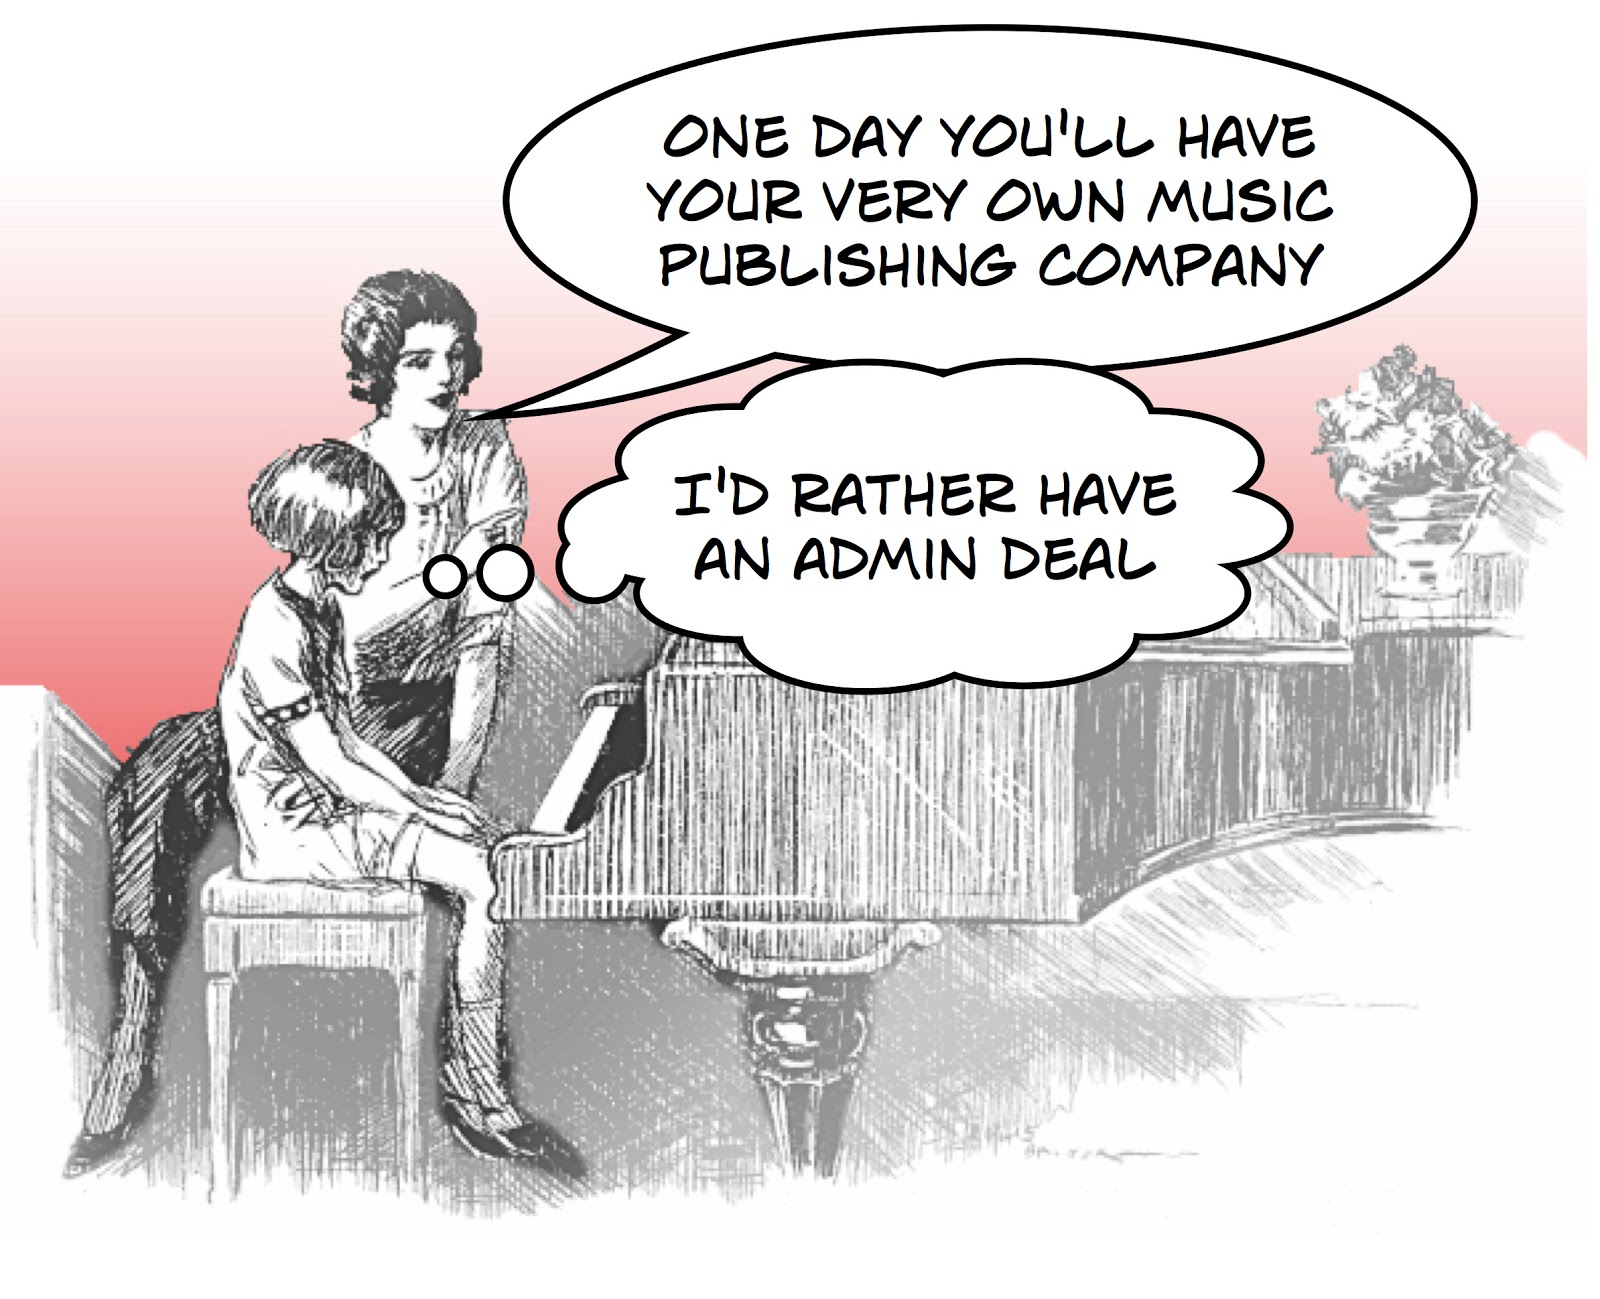 publishing administration deals